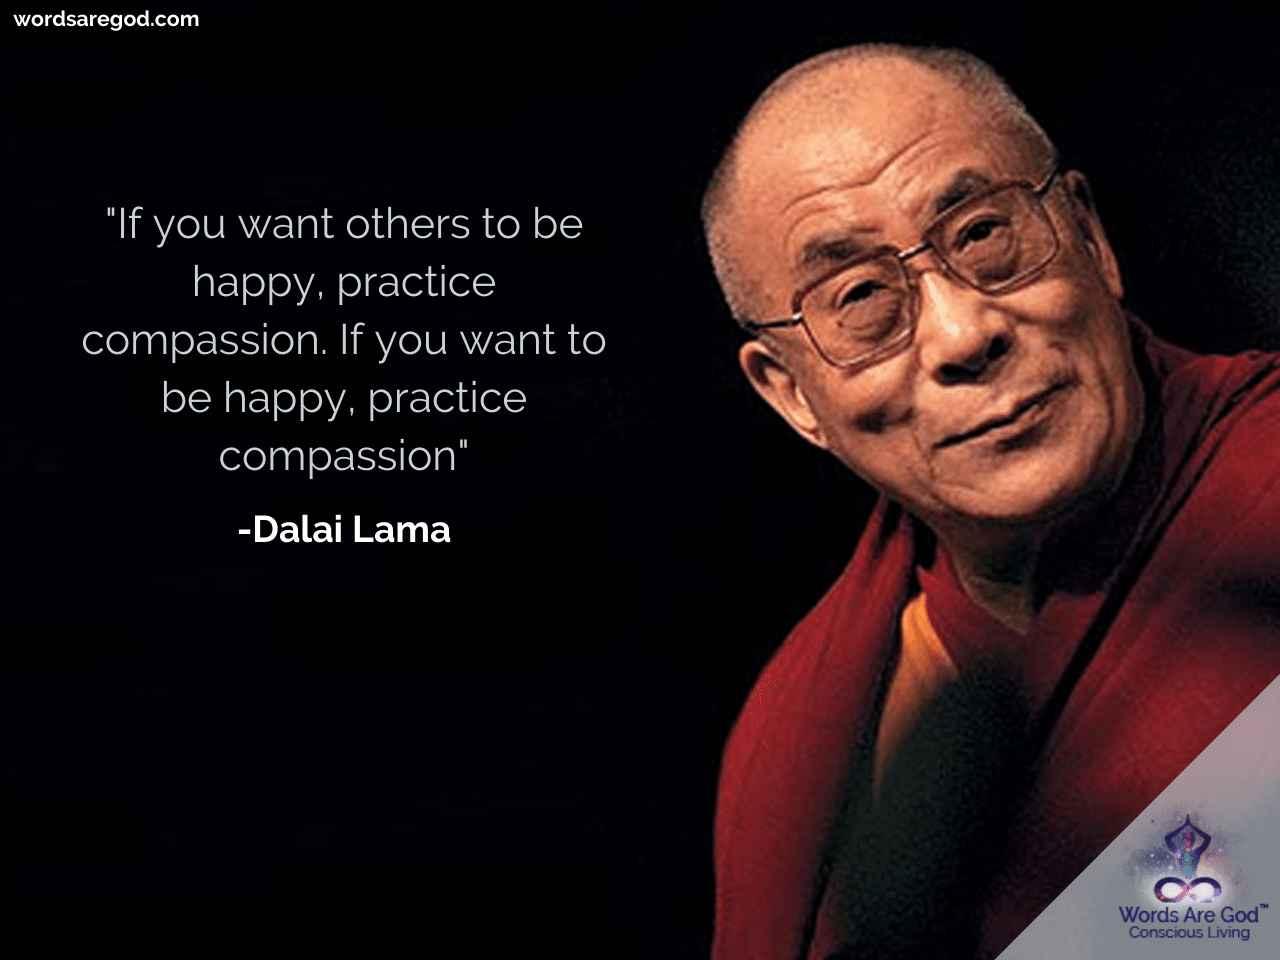 Dalai Lama Motivational Quote